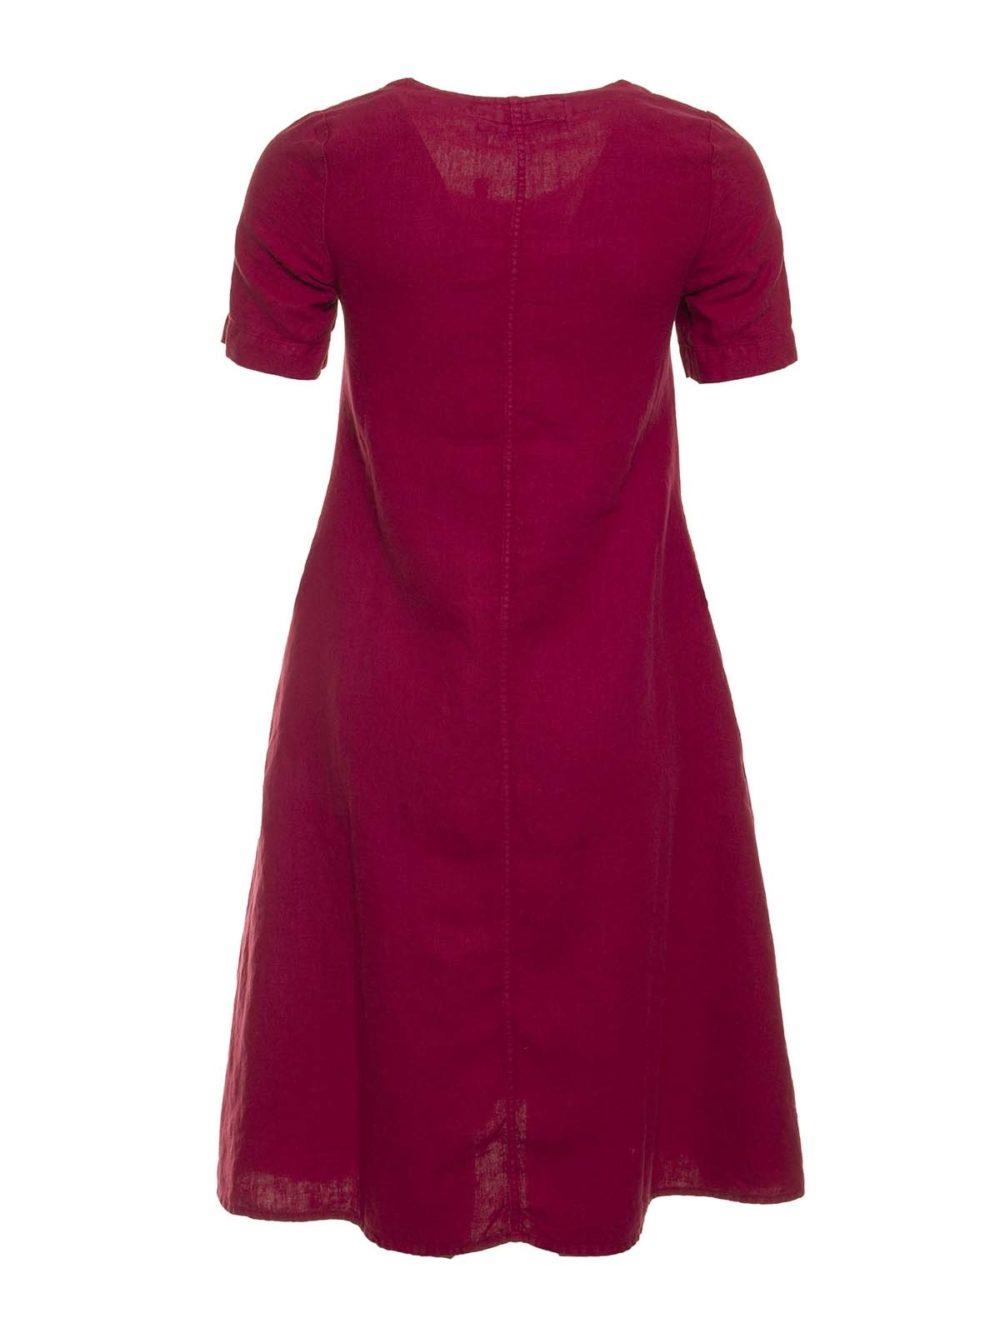 Dress 9995 Grizas Katie Kerr Women's Clothing